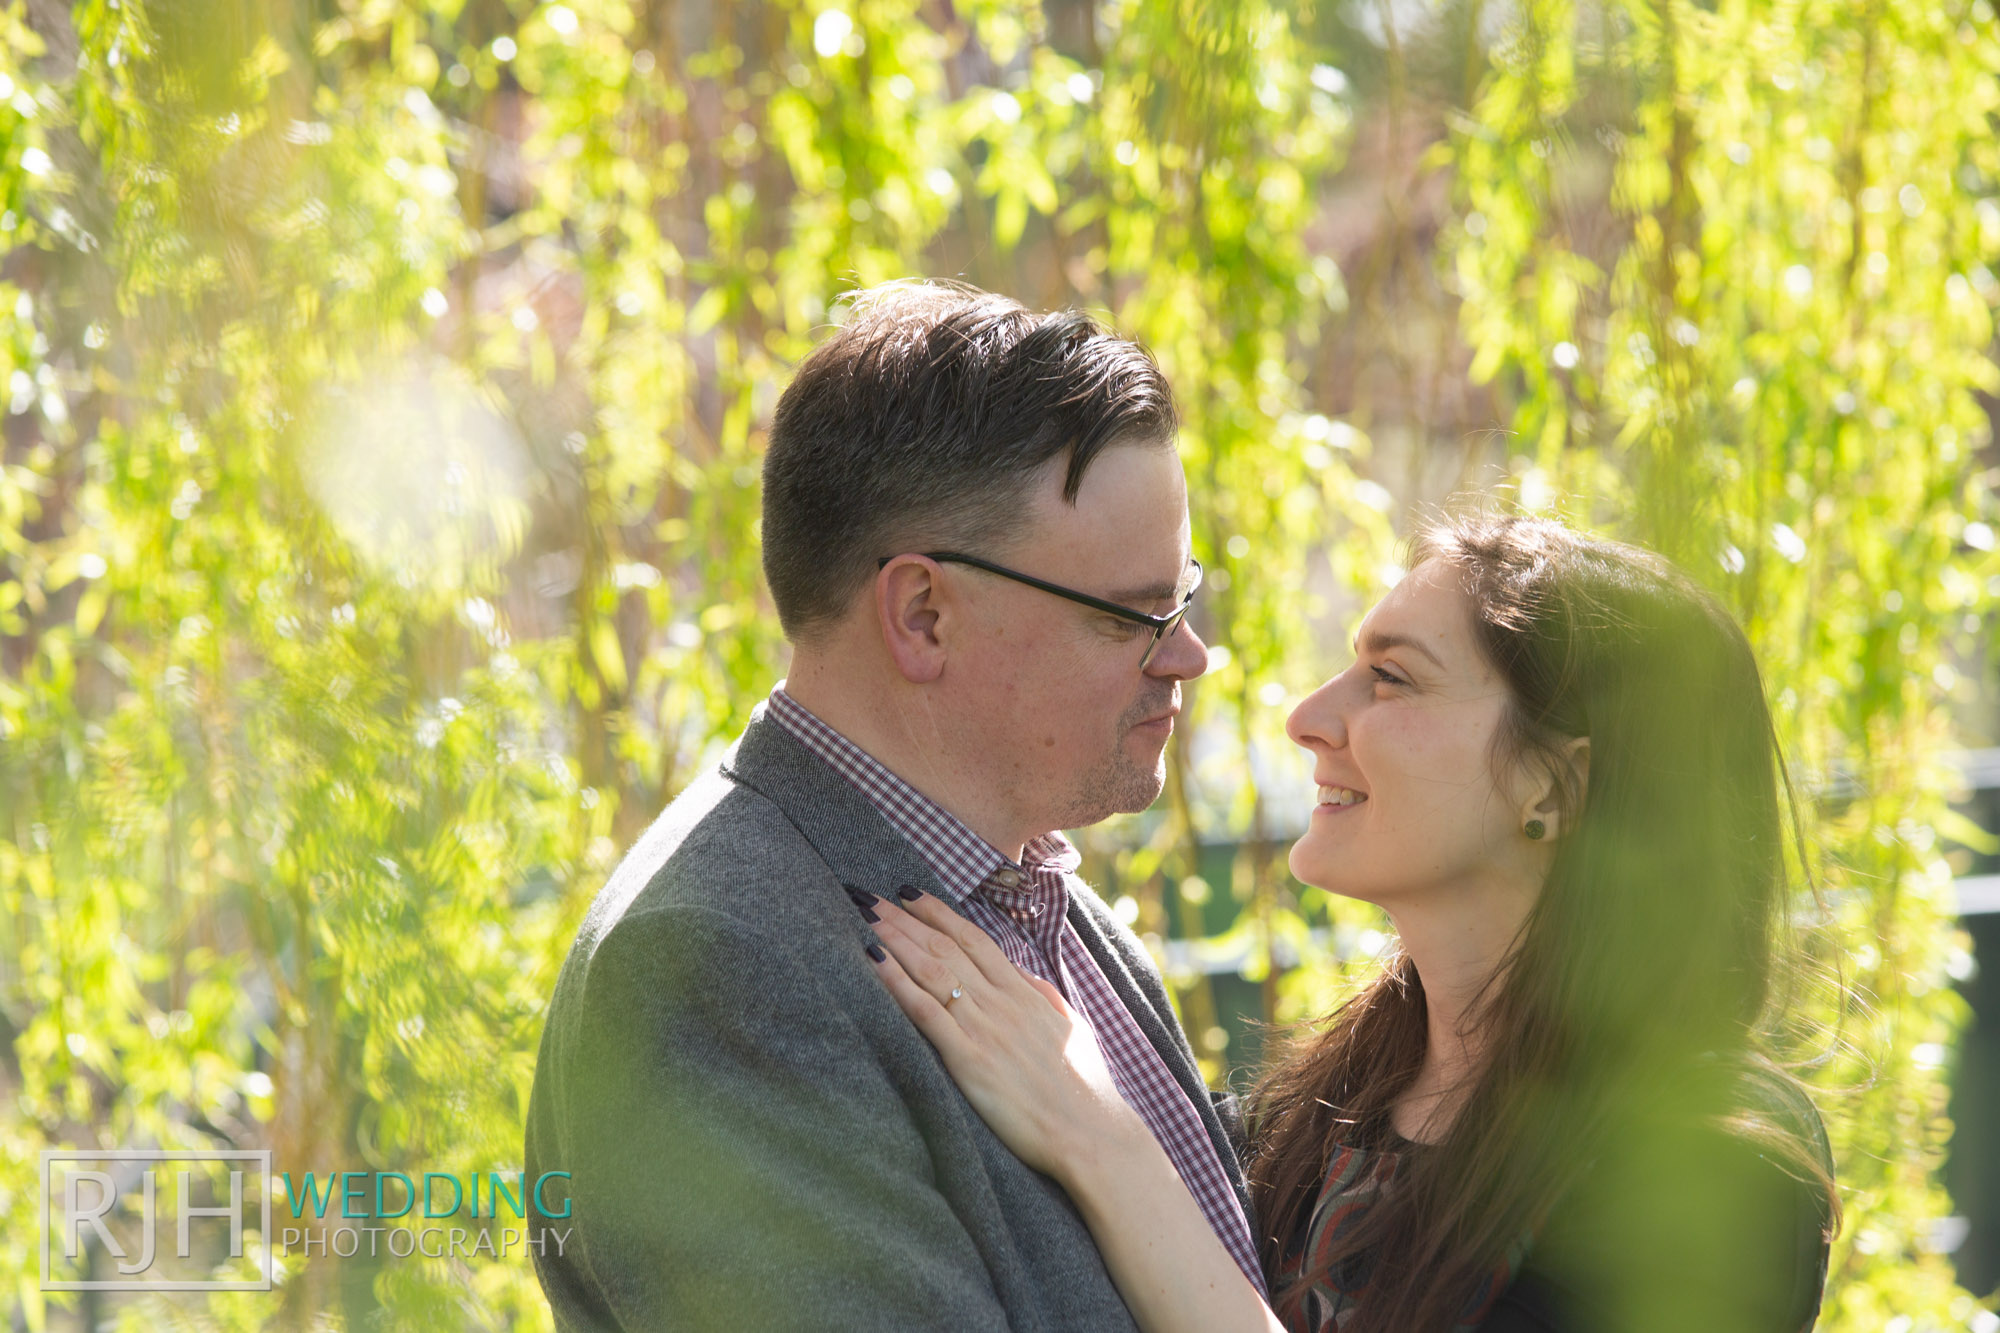 Pre-wedding photography - Richard & Rachel_010_3C2A8172.jpg